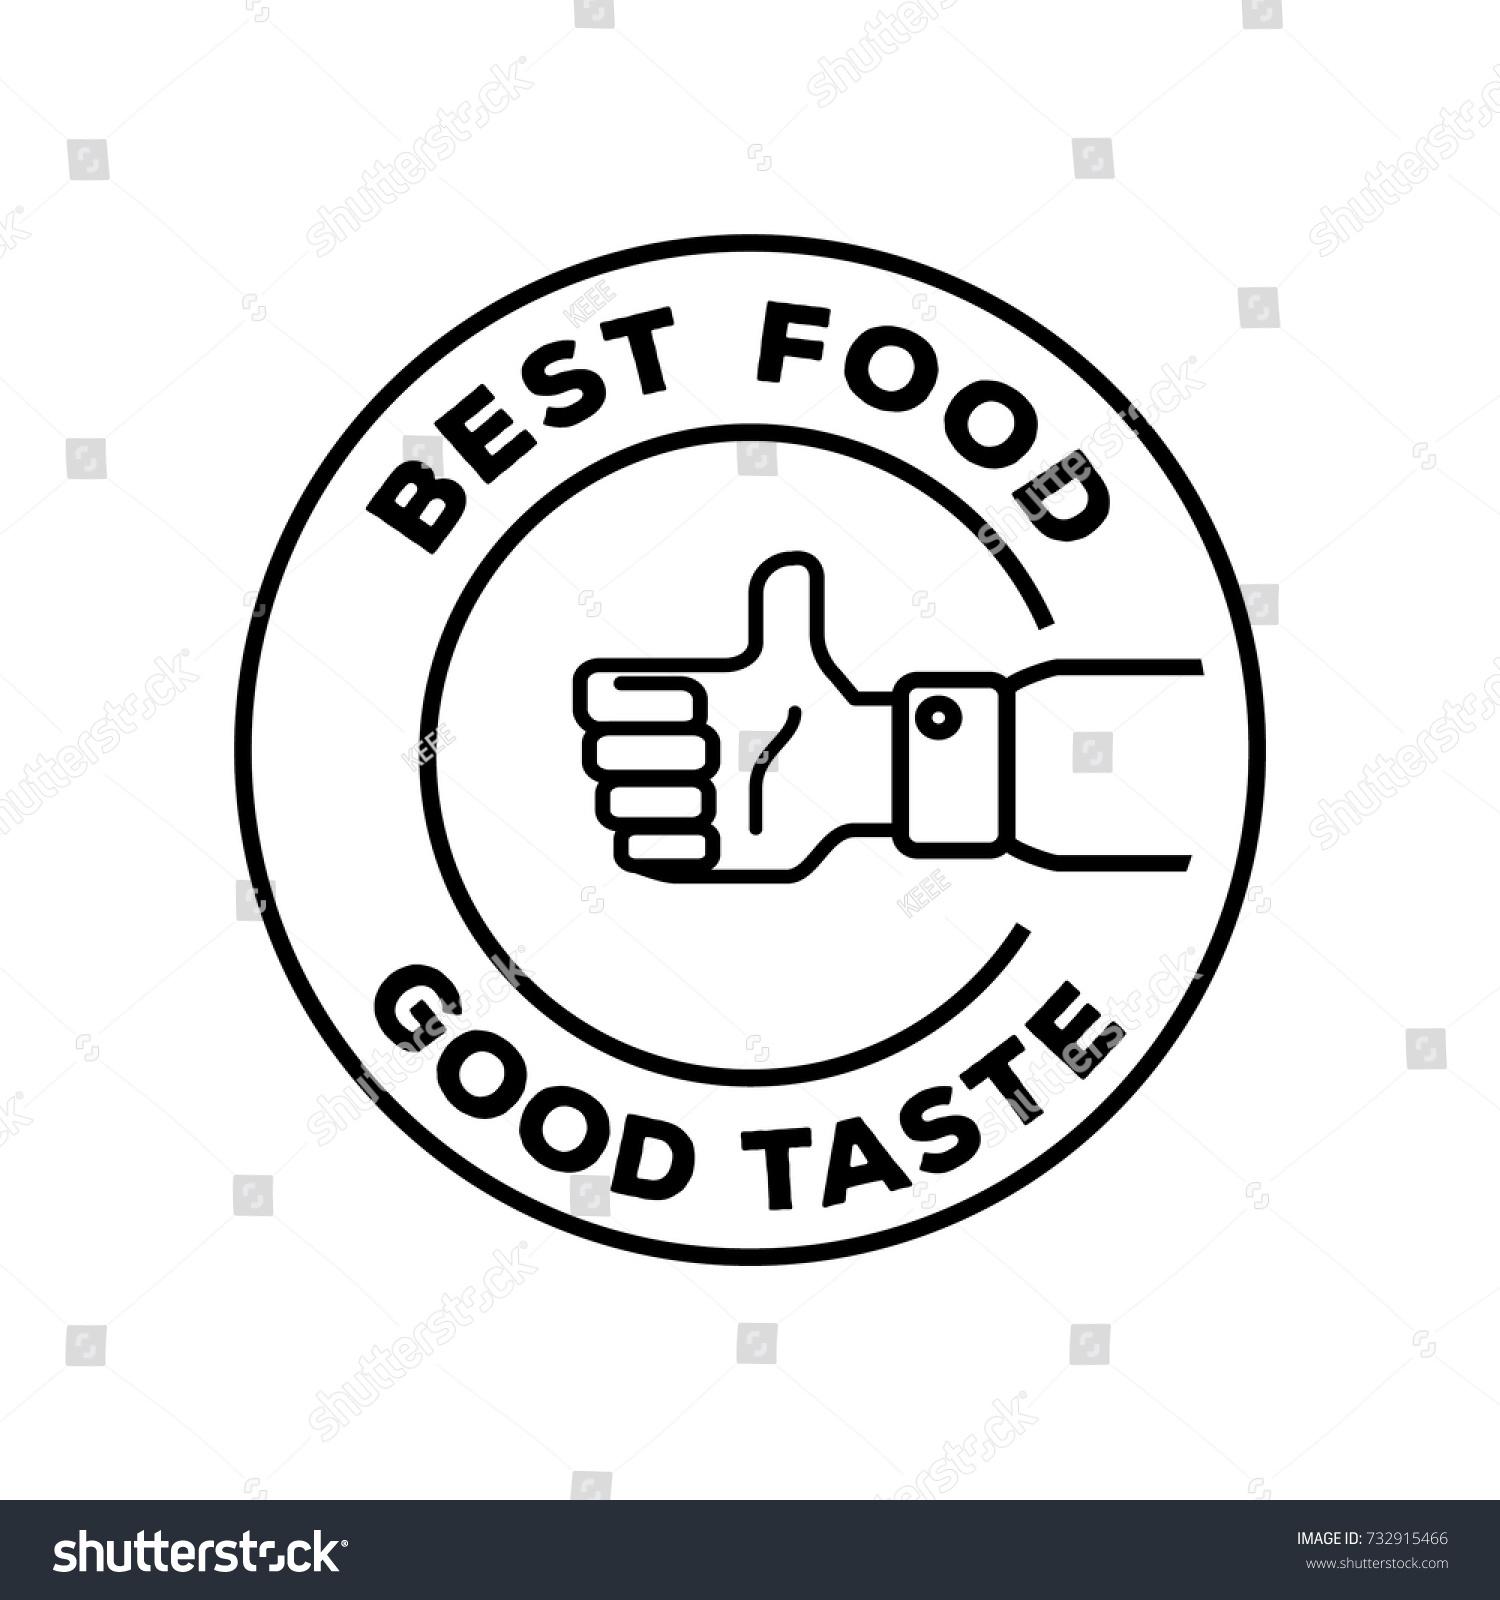 best food good taste logo hand stock vector 732915466 shutterstock